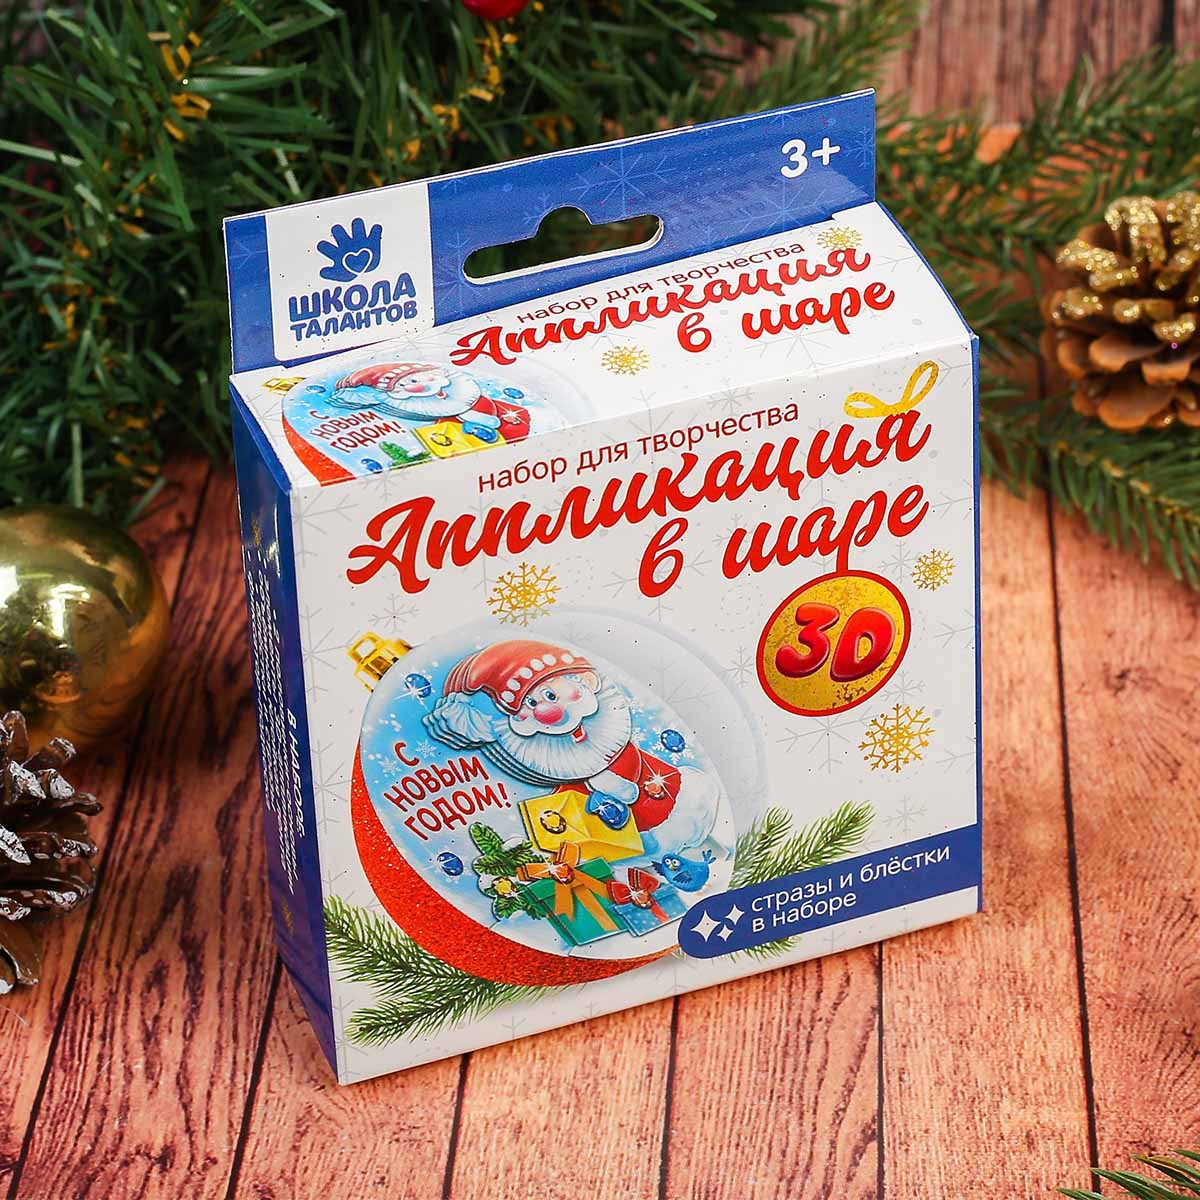 1385768 Набор для творчества: аппликация в шаре 'Дед Мороз с подарками'